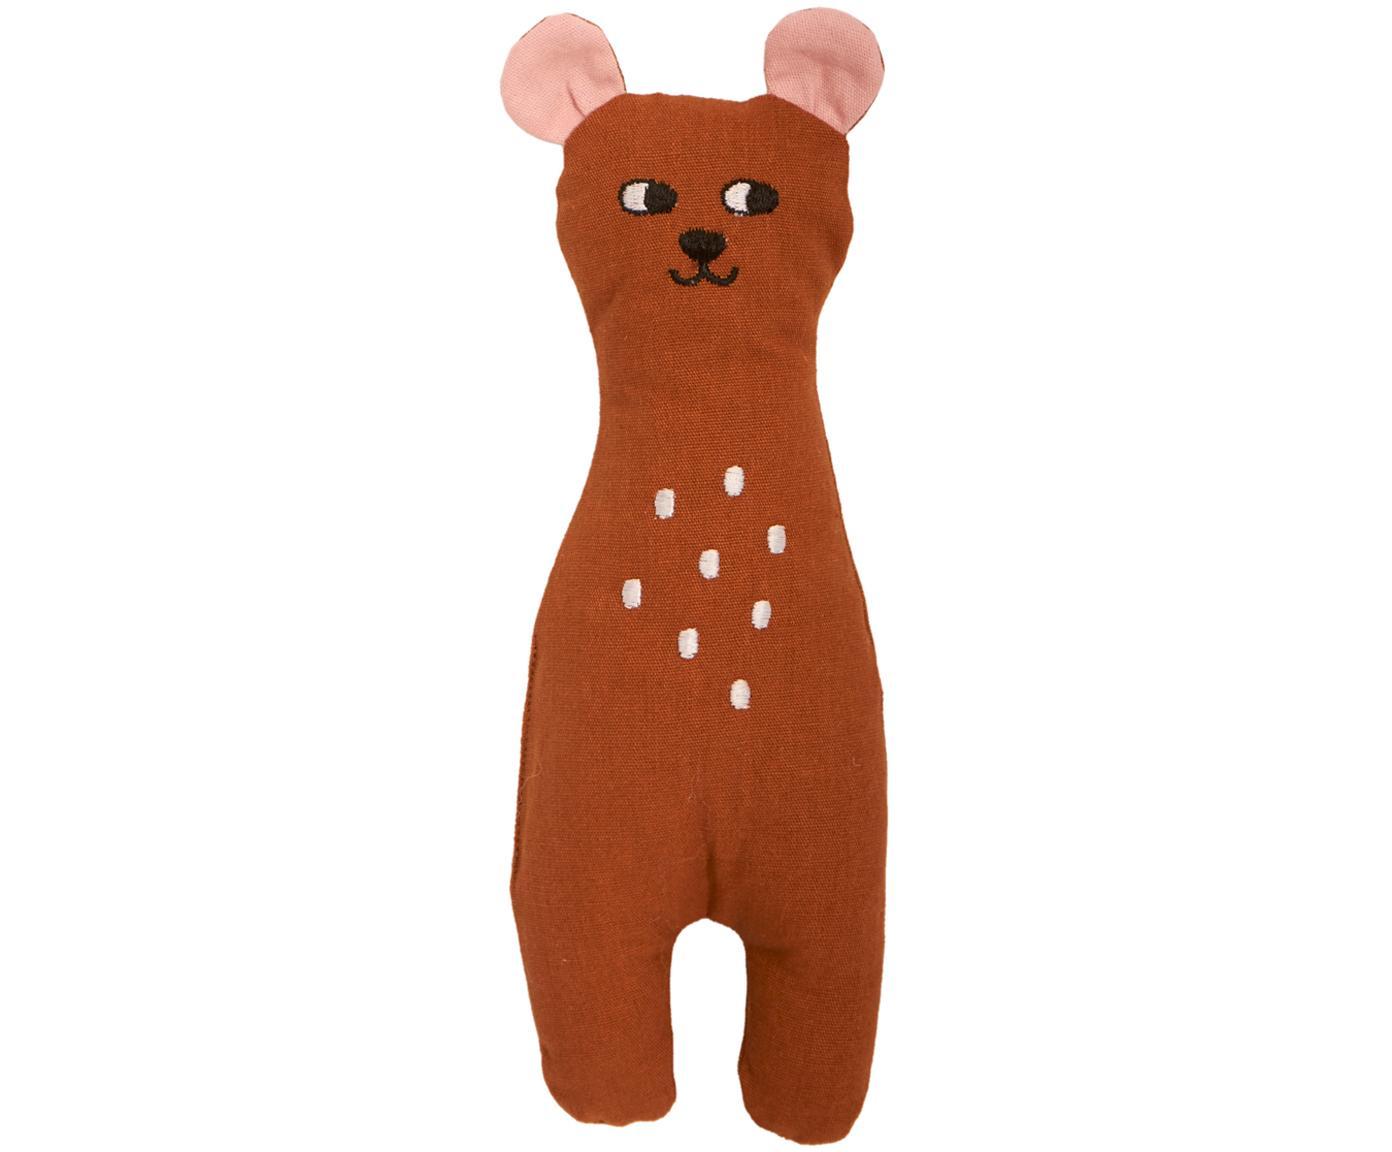 Peluche de algodón ecológico Bear, Marrón, An 8 x Al 25 cm